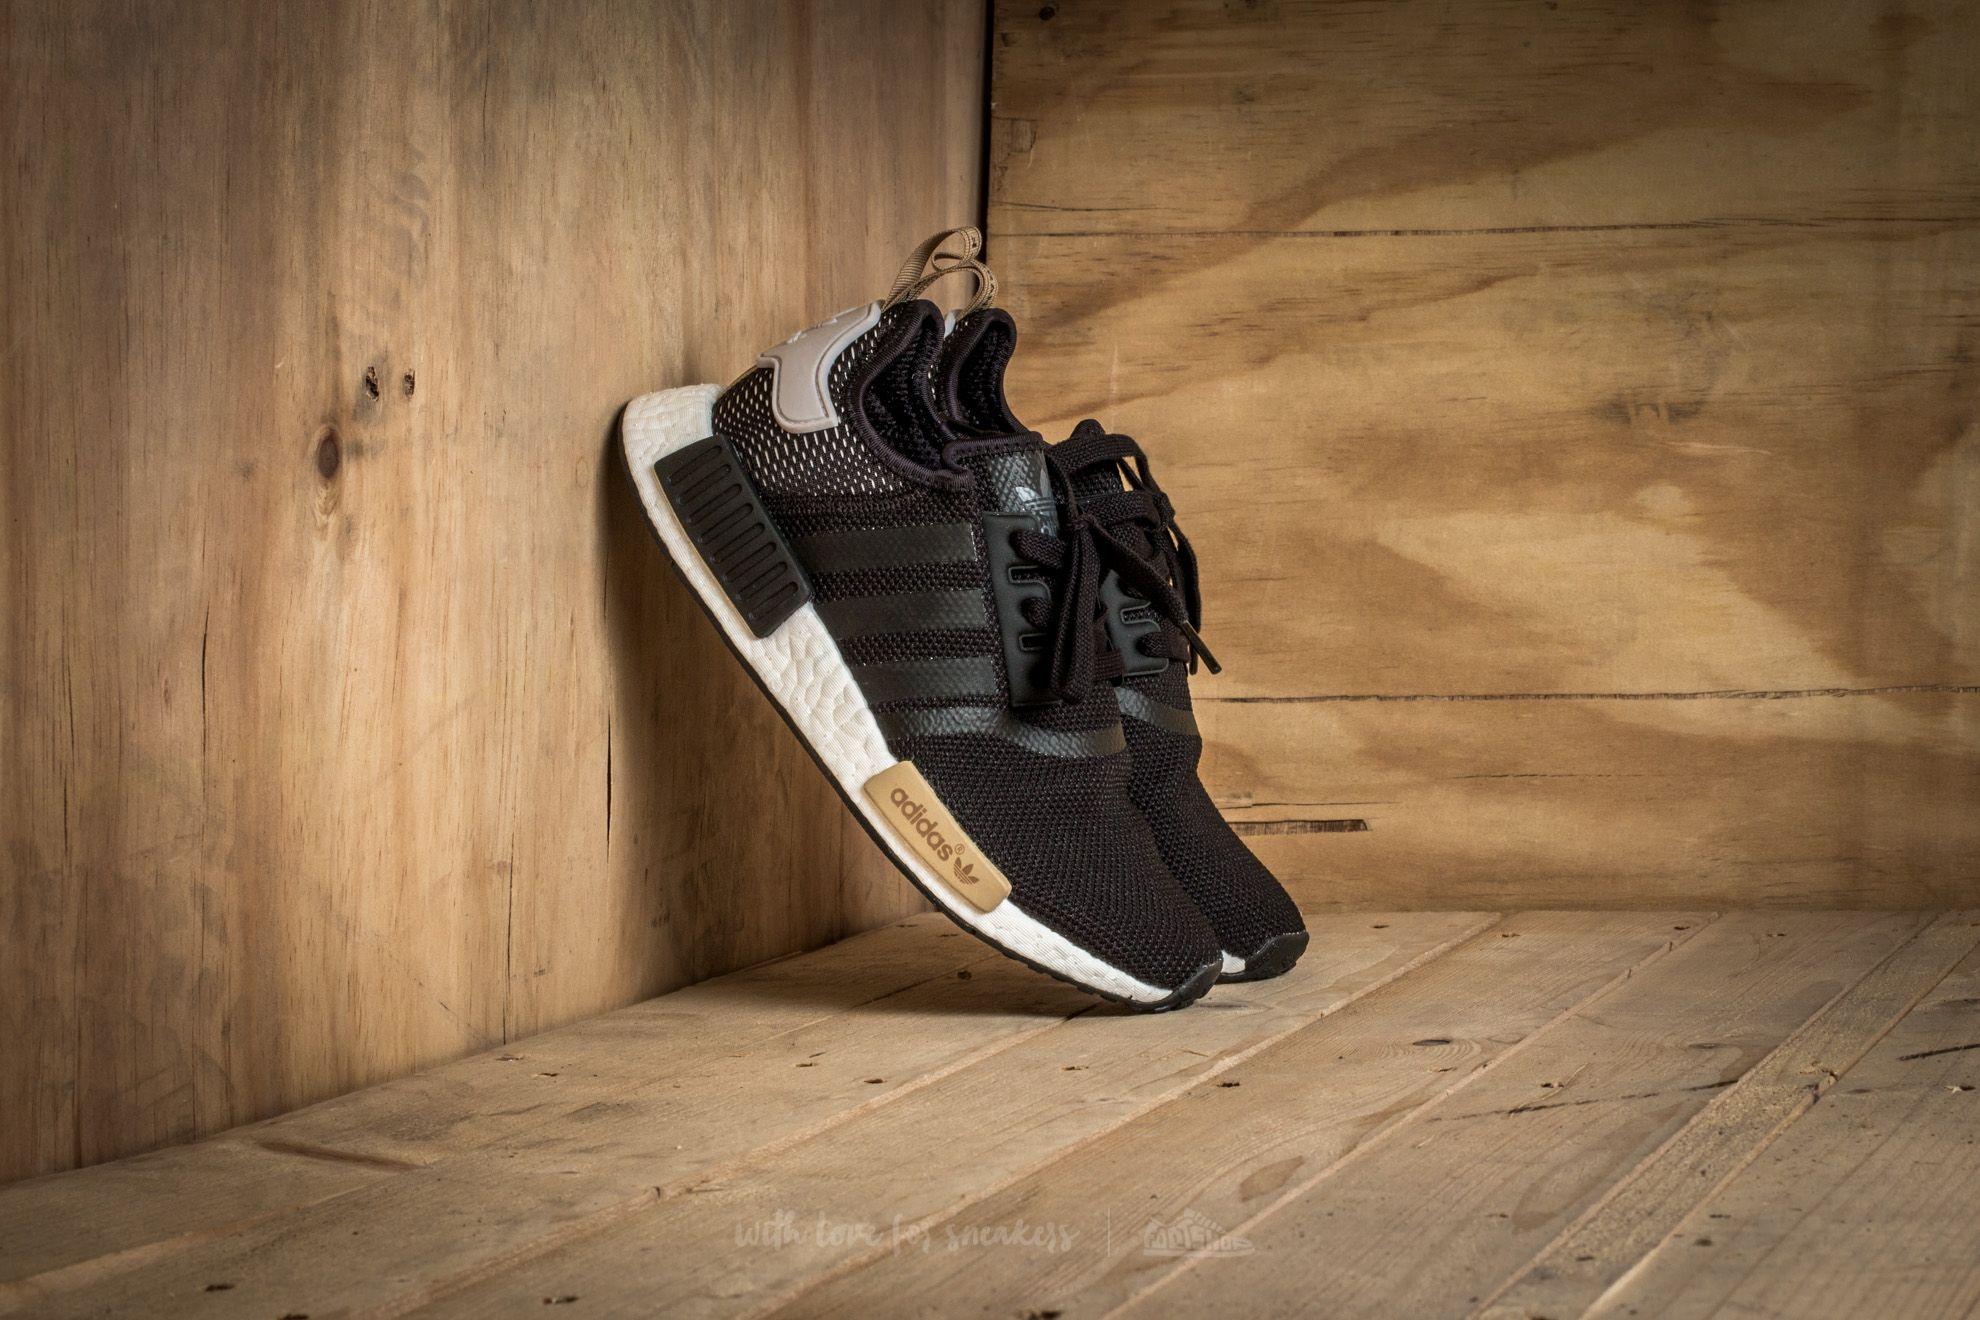 r1 Adidas Ice W Core Black Nmd PurpleFootshop qLpUVSzMG